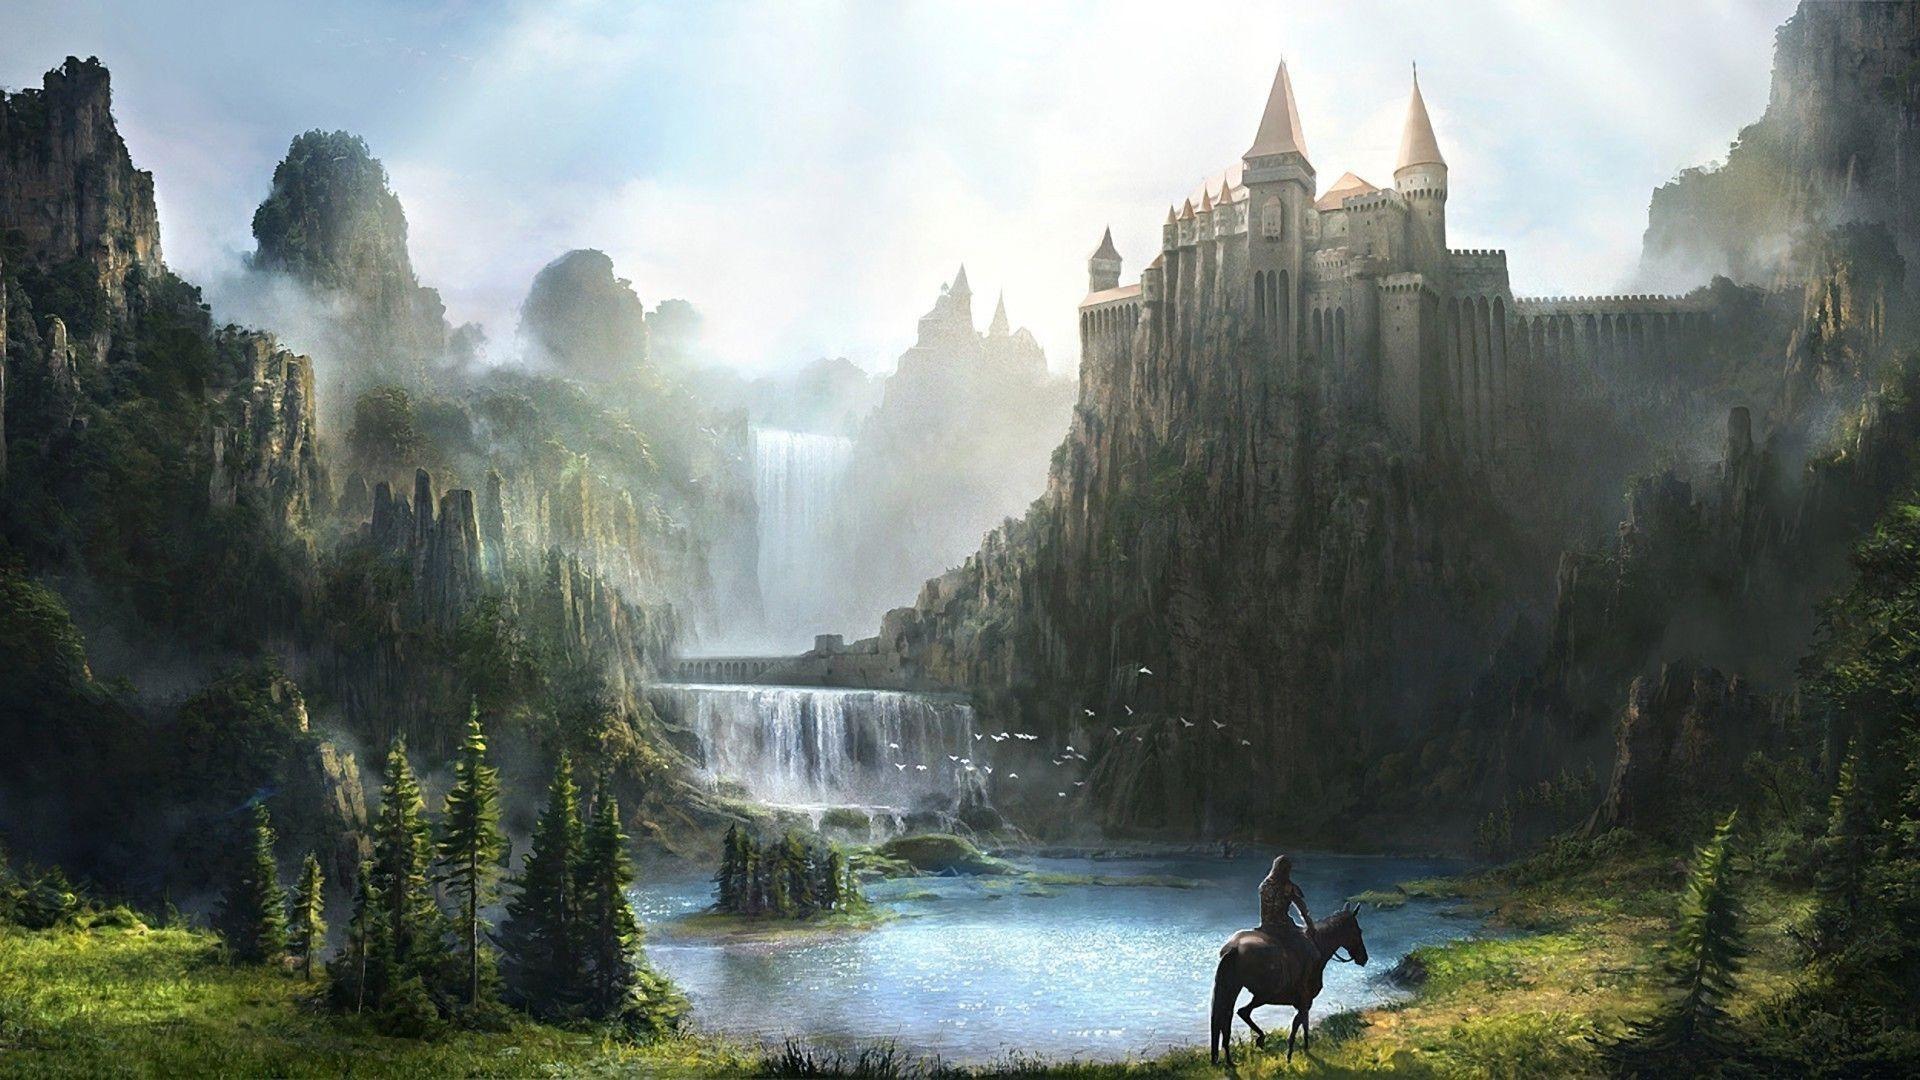 Fantasy Castle Wallpaper (88+ images)